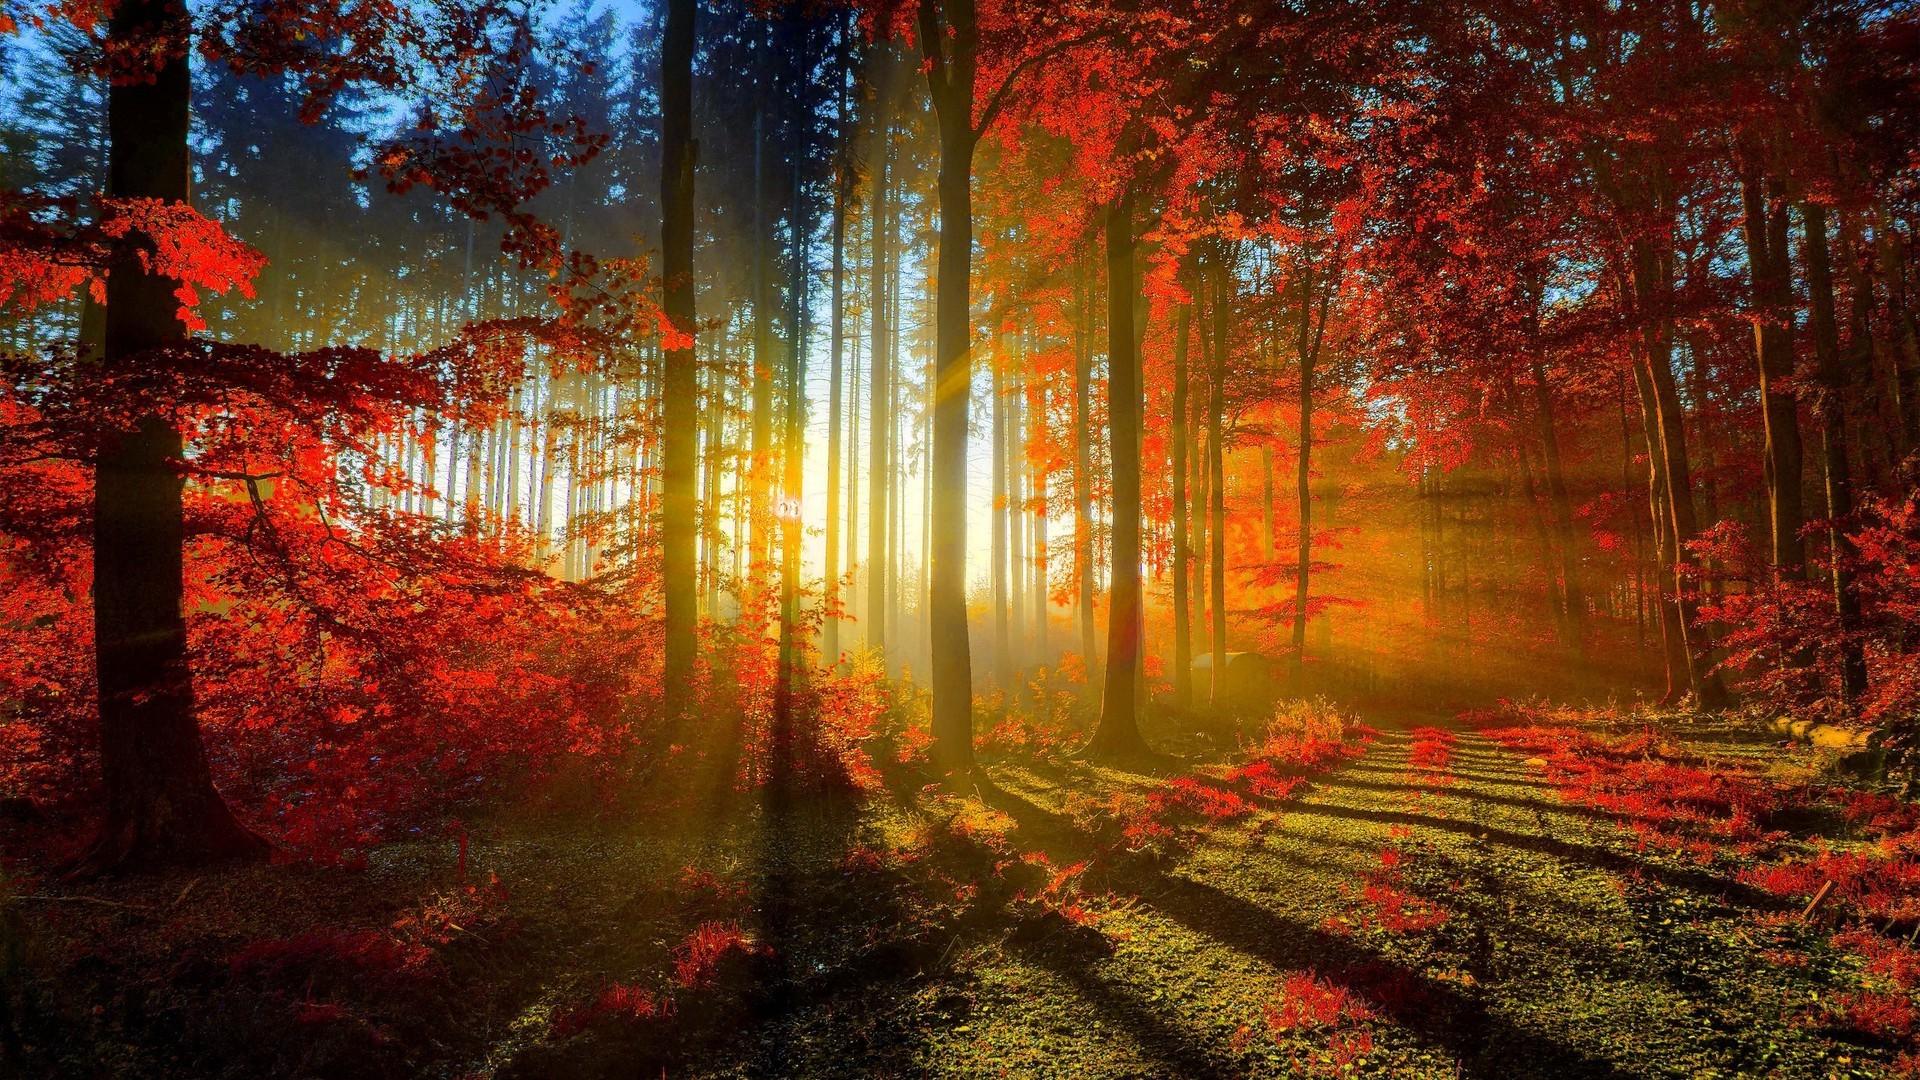 Beautiful Nature Hd Wallpapers Download 15862 Wallpaper 1920x1080